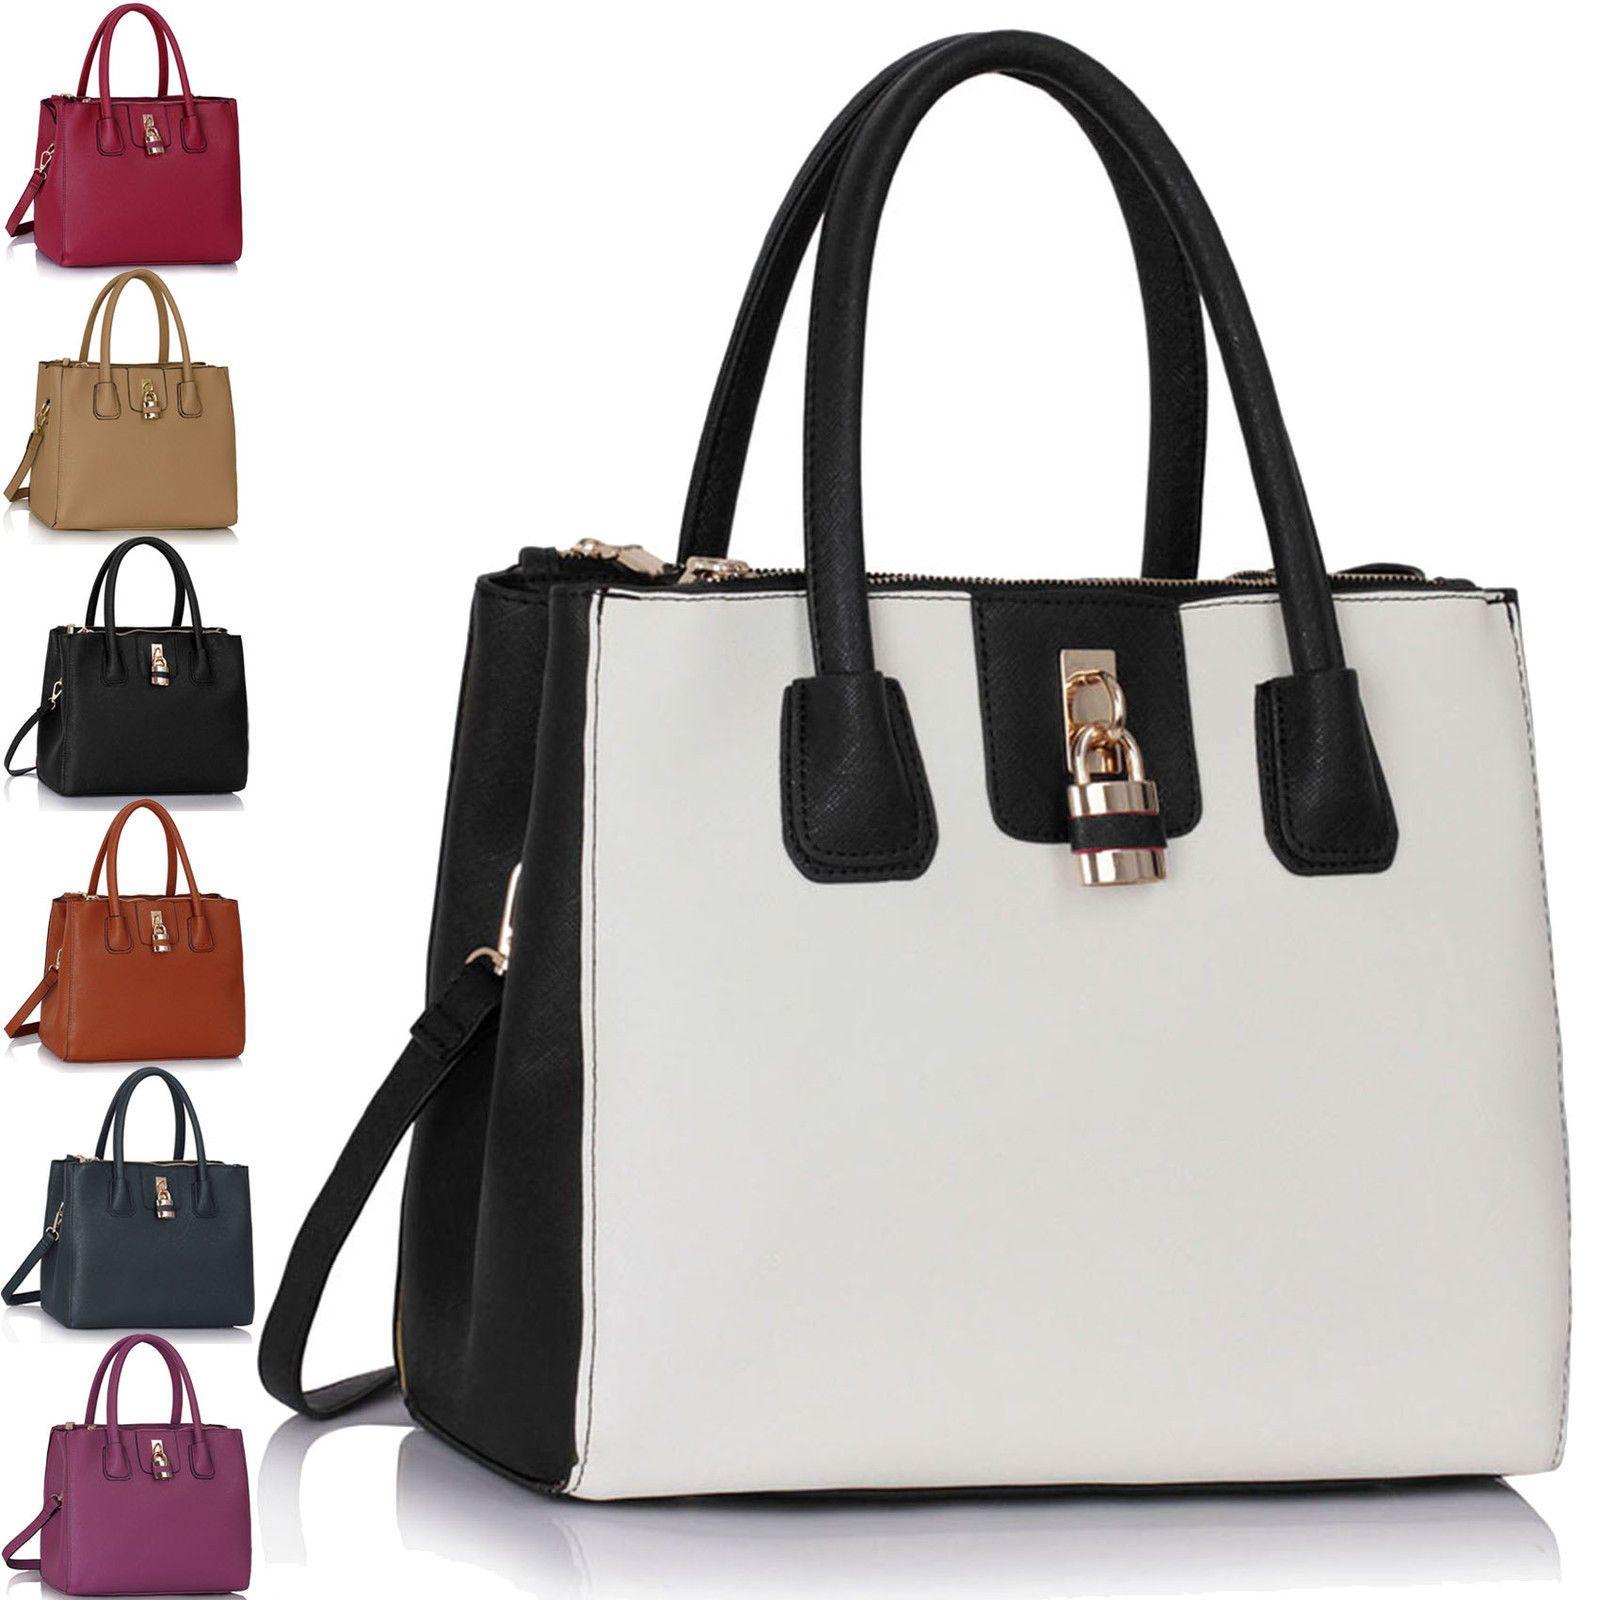 0cb9f3345ed6 Ladies Leather Handbags Large Womens Designer Bags Tote Shoulder New ...